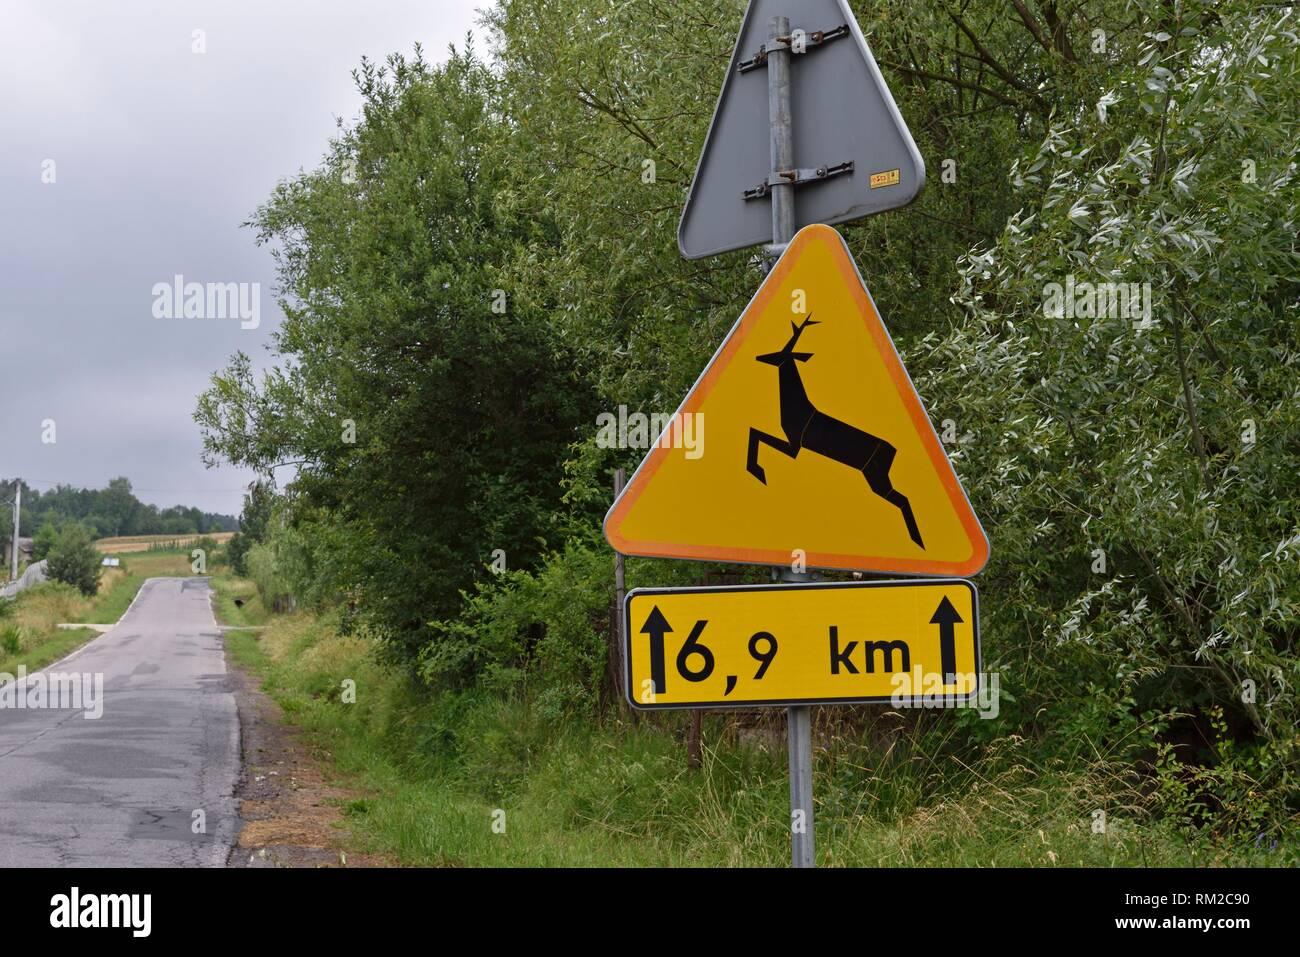 Malopolska Province (Lesser Poland), Poland, Central Europe. - Stock Image